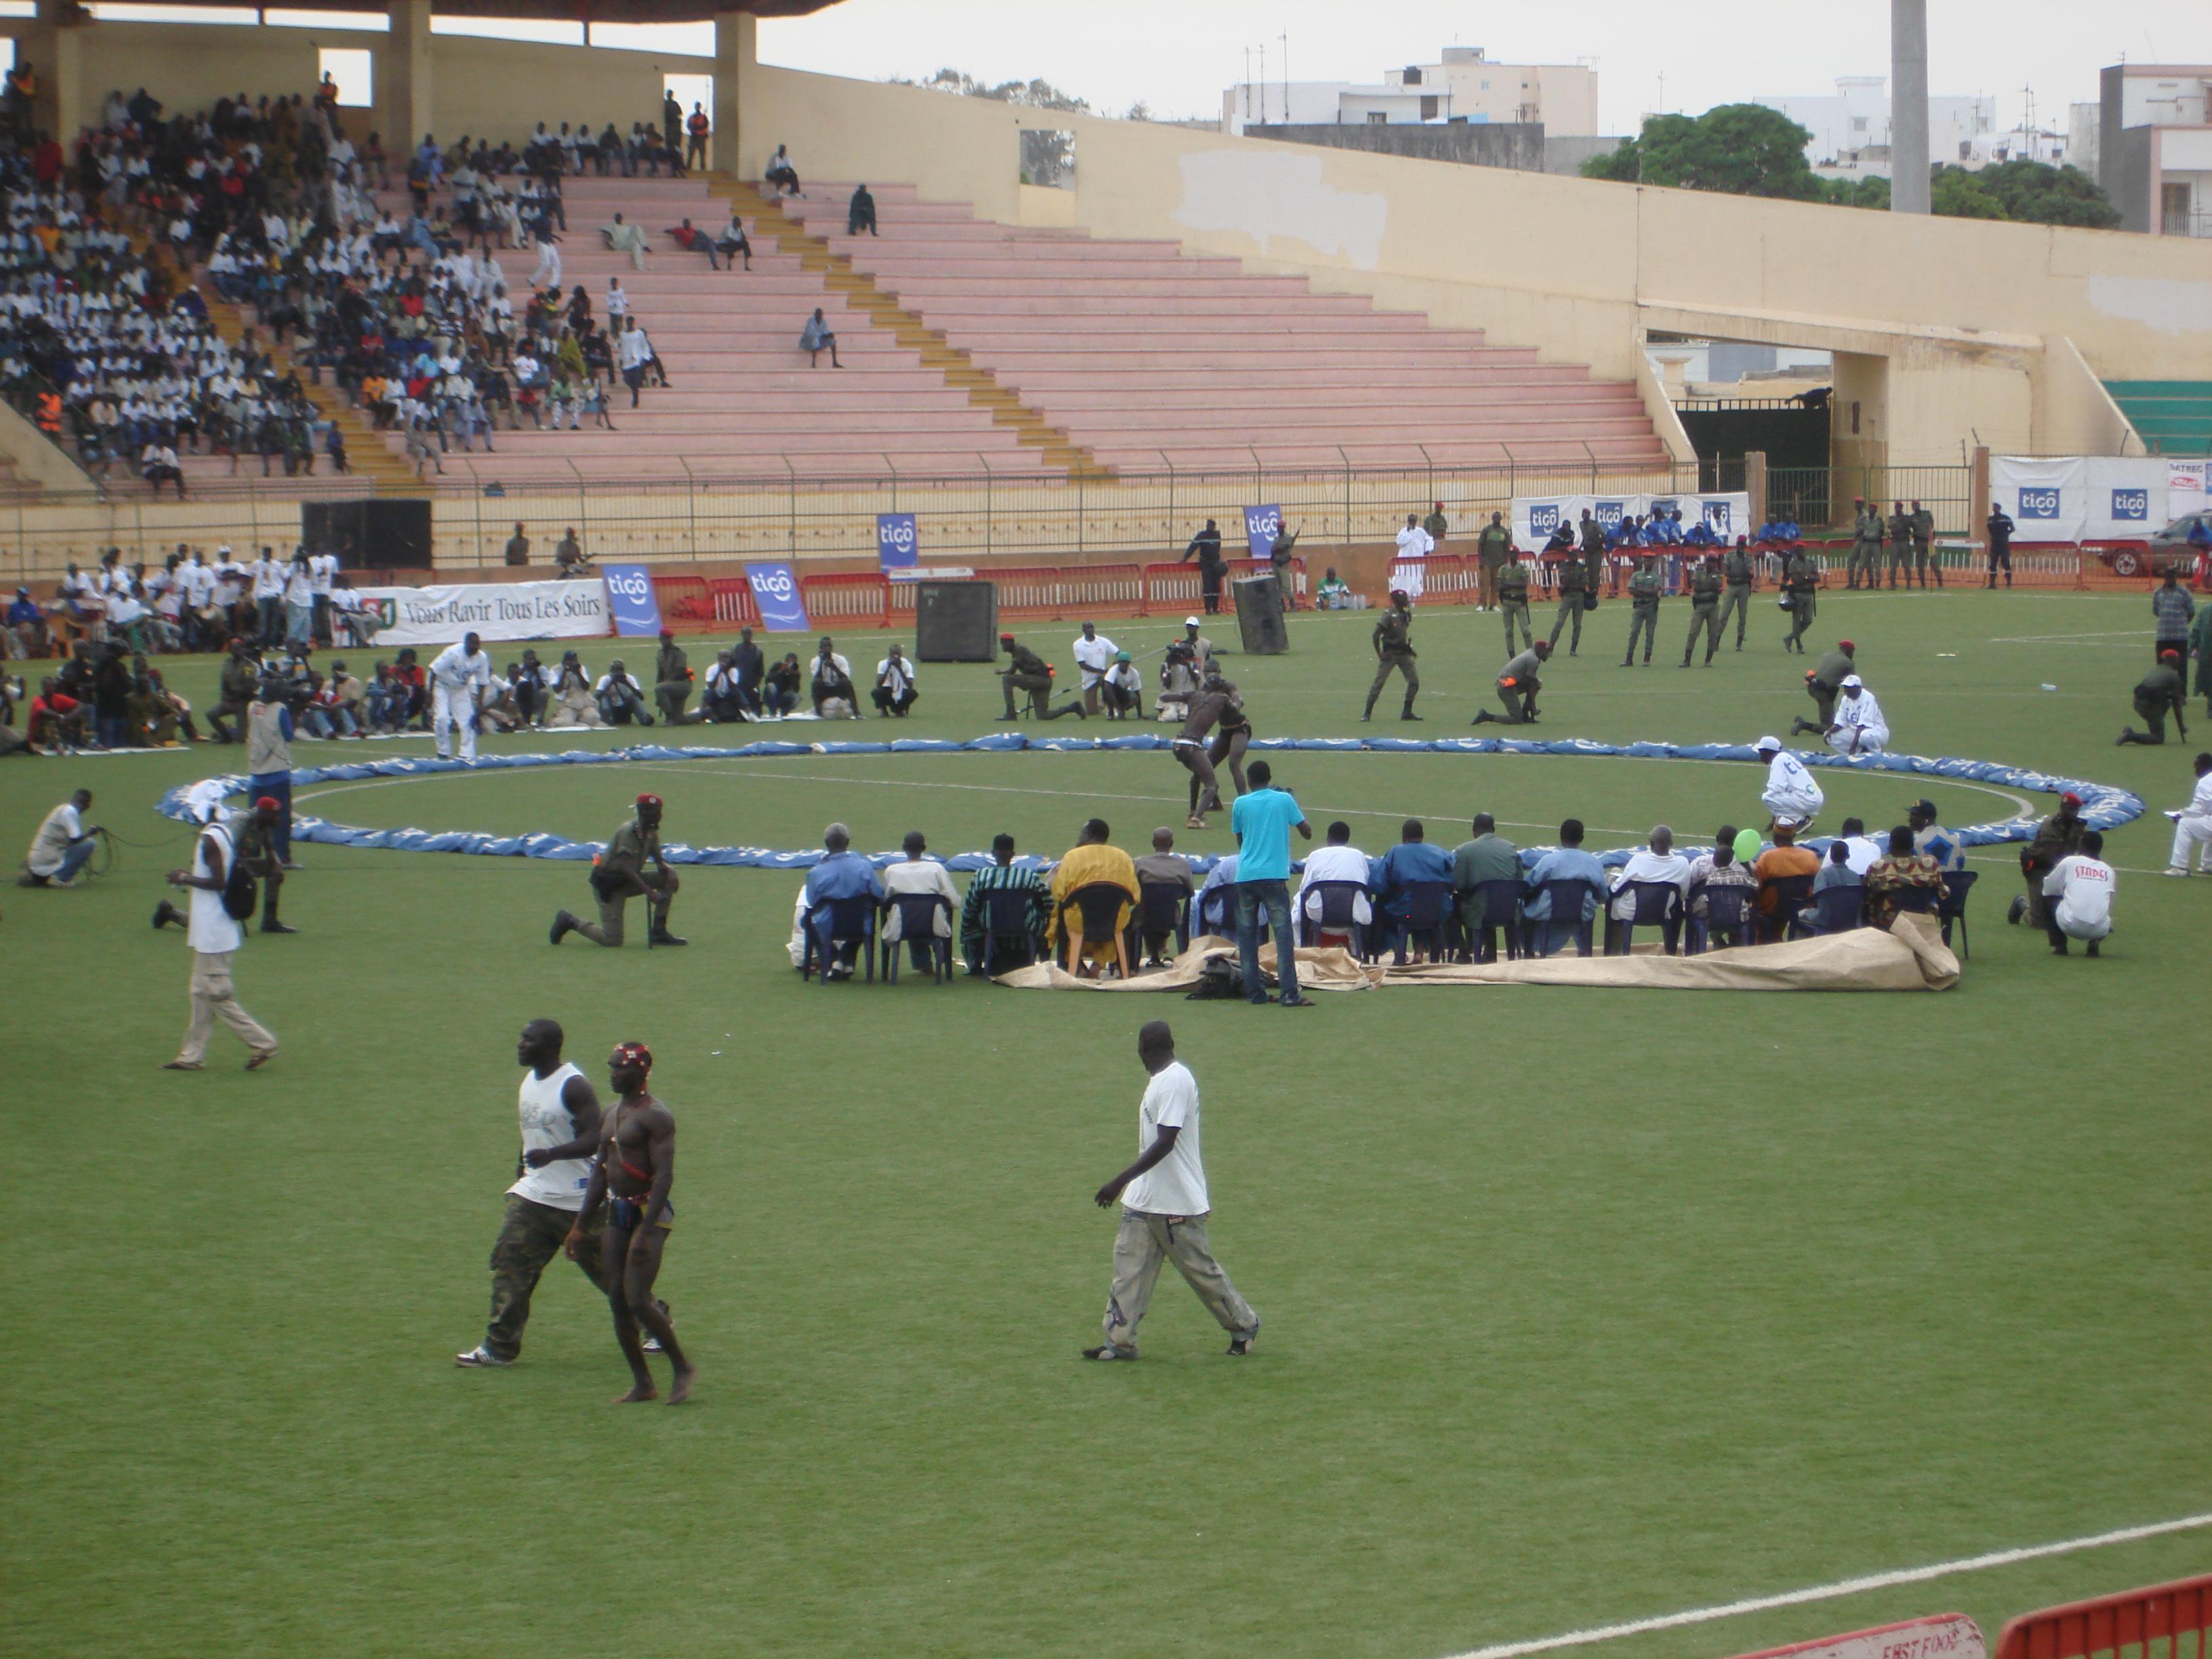 Senegalese wrestling match at the Stade Demba Diop in Dakar, Senegal. Photo taken on February 6, 2006.